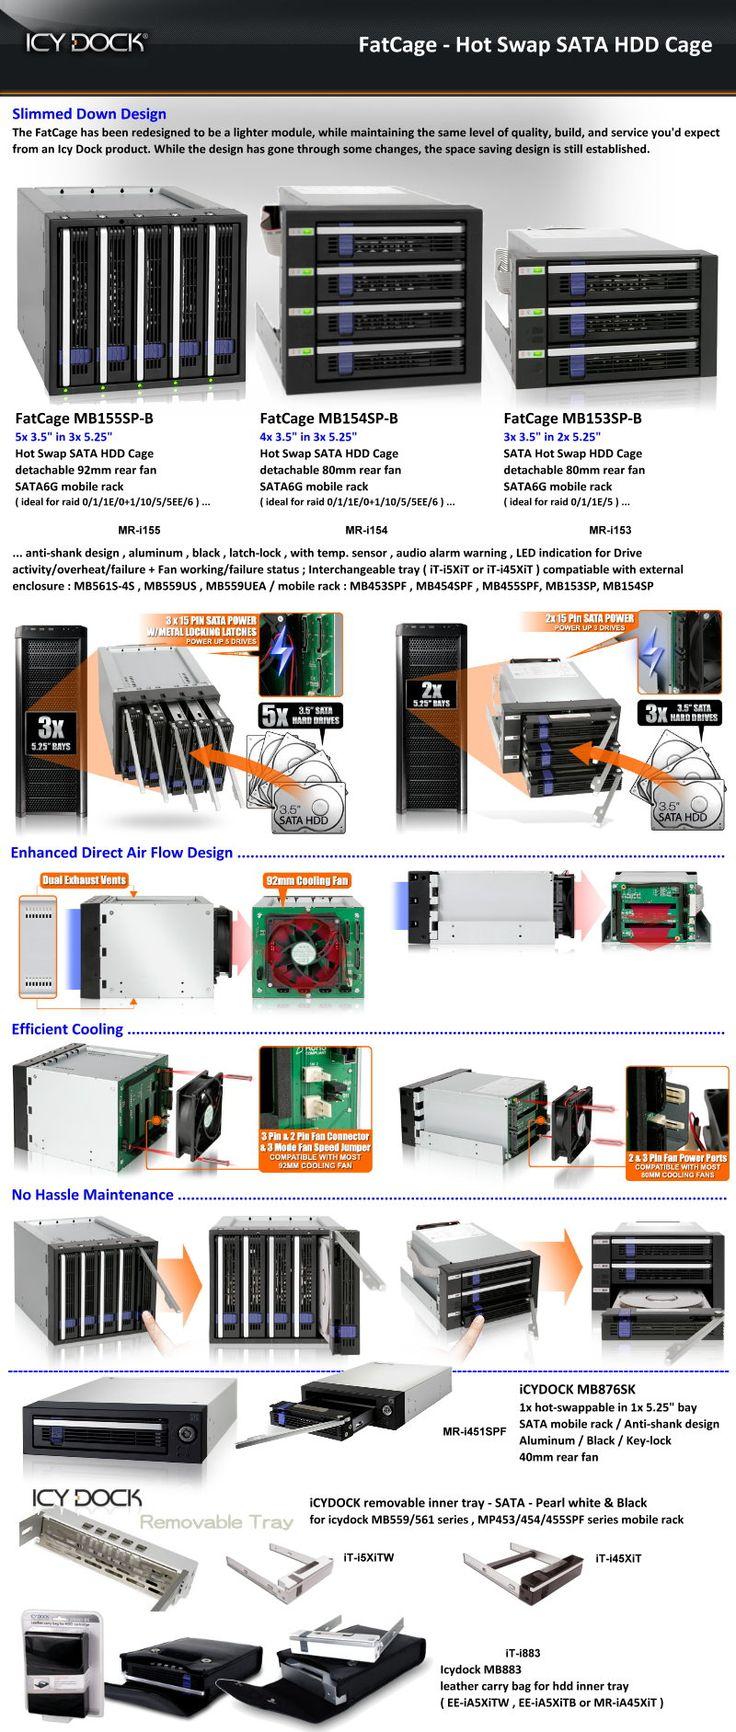 FatCage - Hot Swap SATA HDD Cage